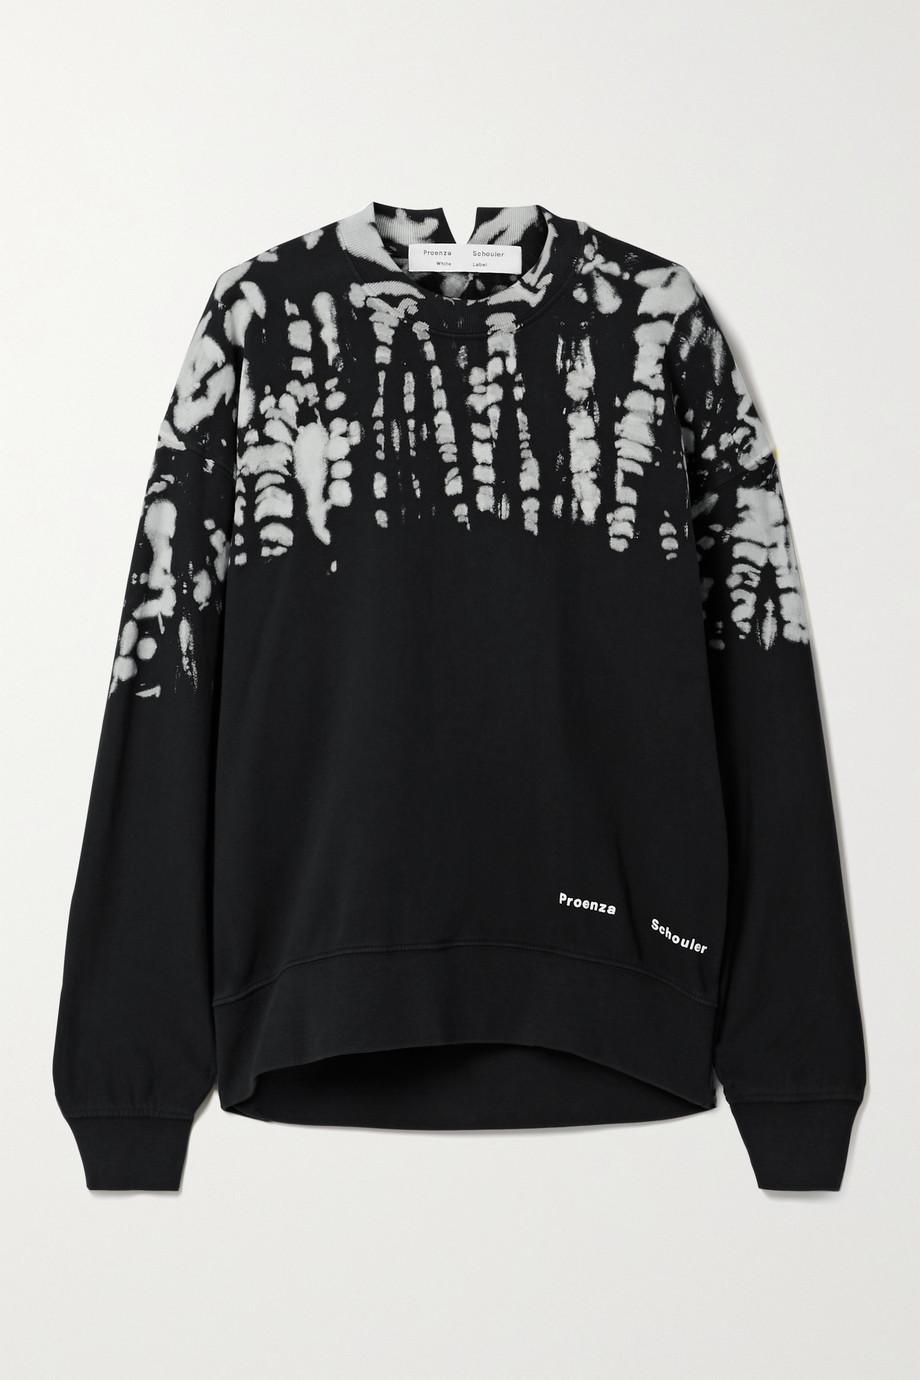 Proenza Schouler White Label Tie-dyed cotton-jersey sweatshirt